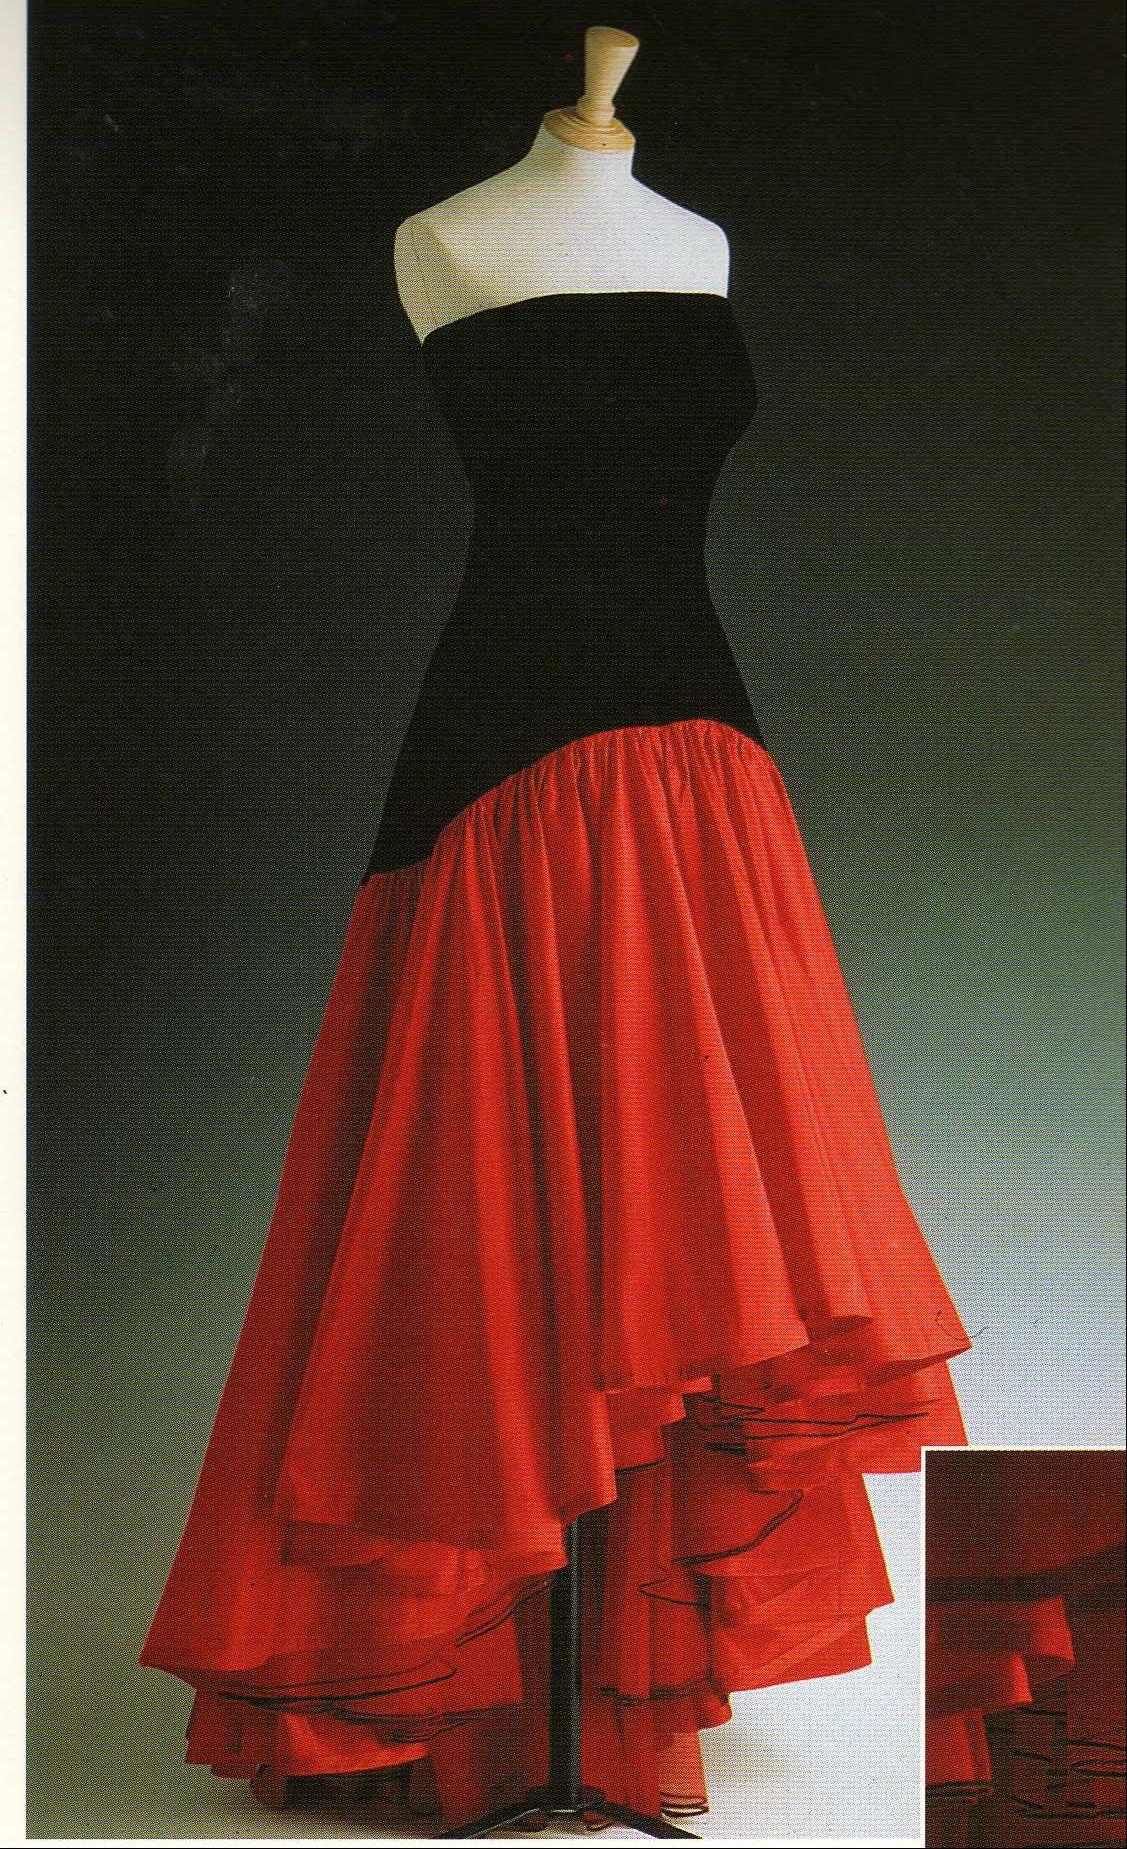 Red and Black Flamenco Dress by Murray Arbeid 1987 | Maltese cross ...